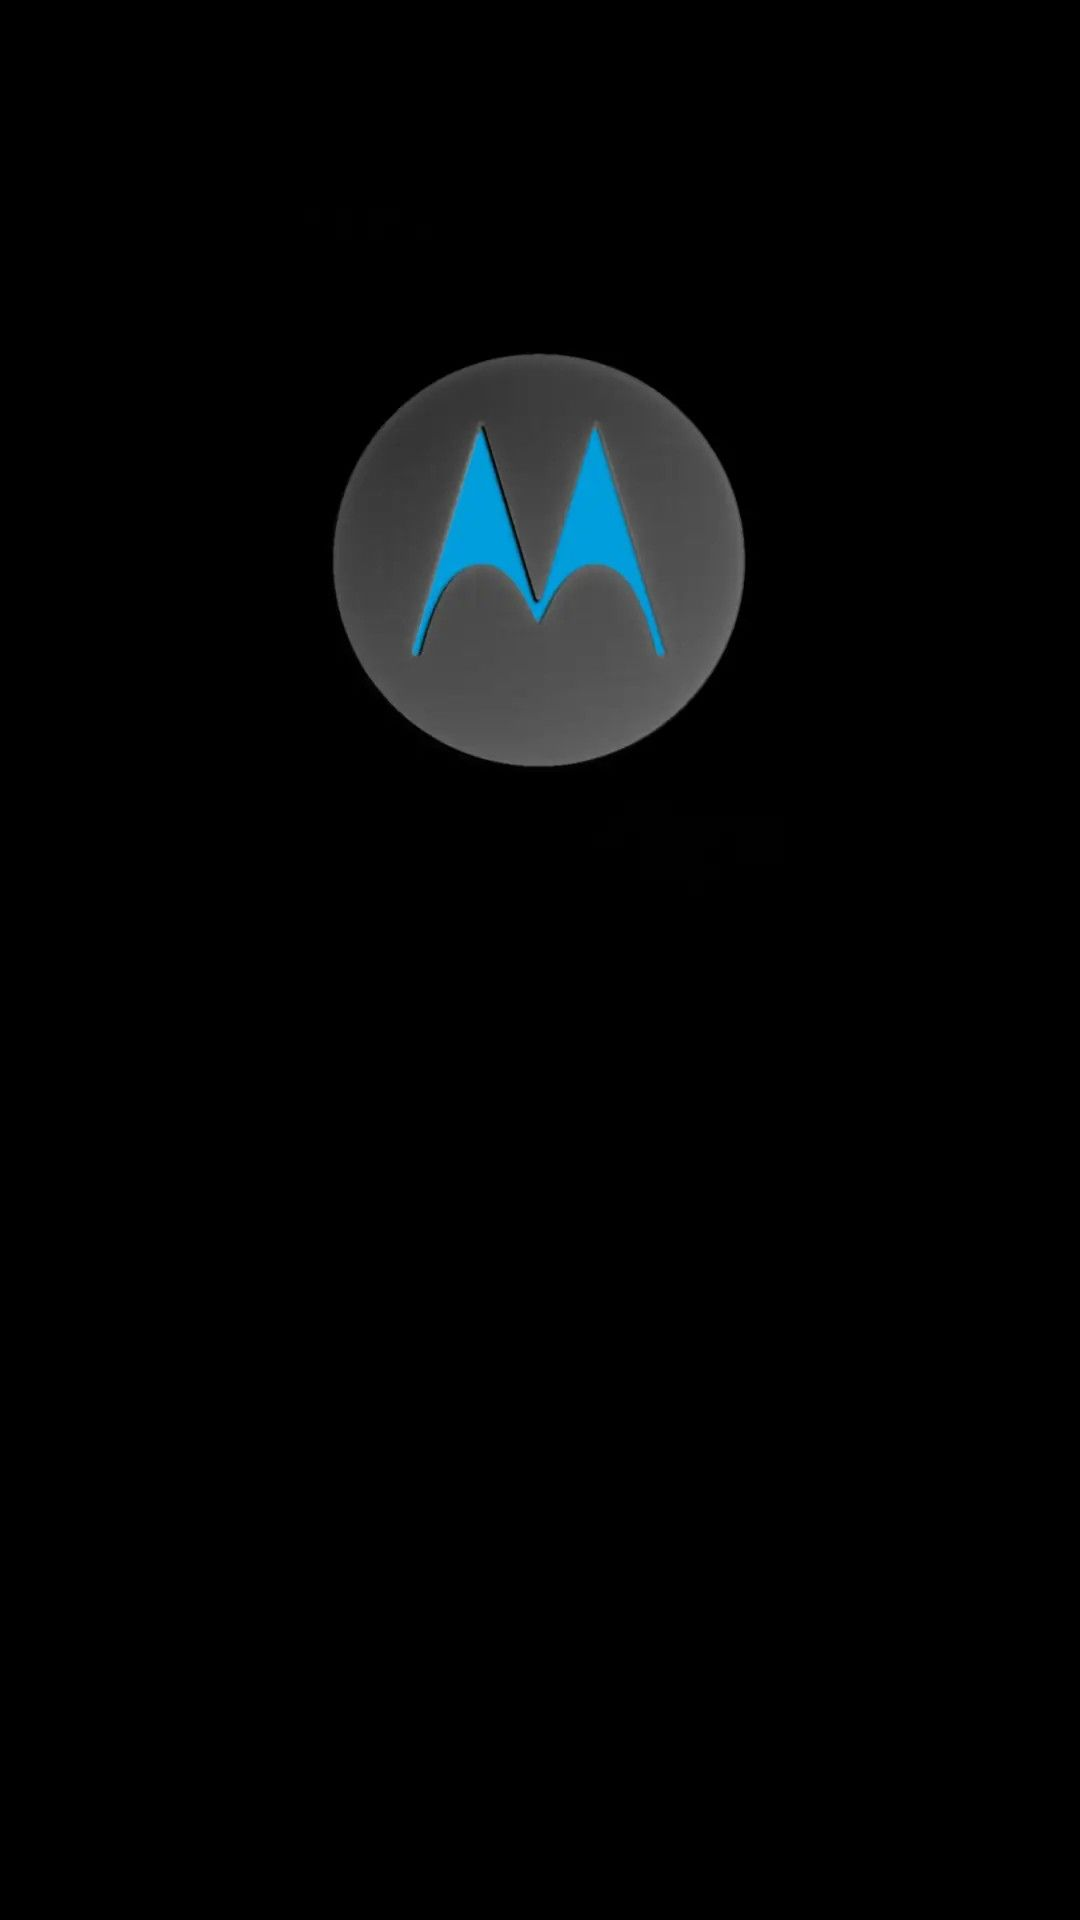 Pin De Planet Wallpaper En Motorola Logo Wallpapers Motorola Fondos De Pantalla Fondos De Pantalla Fondos De Pantalla Palmeras